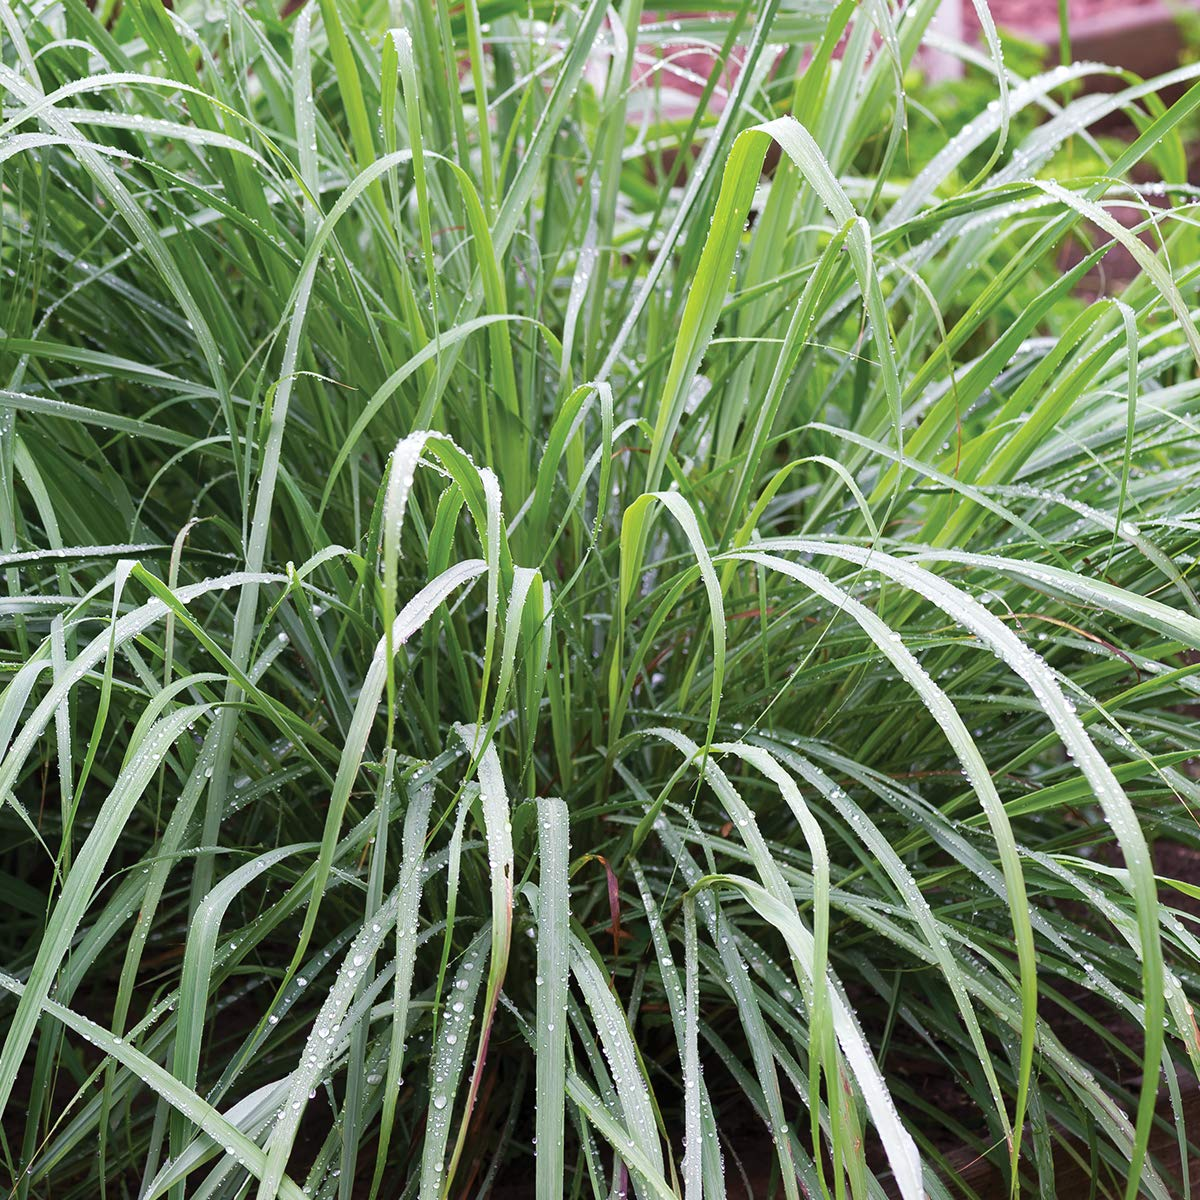 Burpee Lemongrass Herb | 3 Live Plants, 2 1/2'' Pot